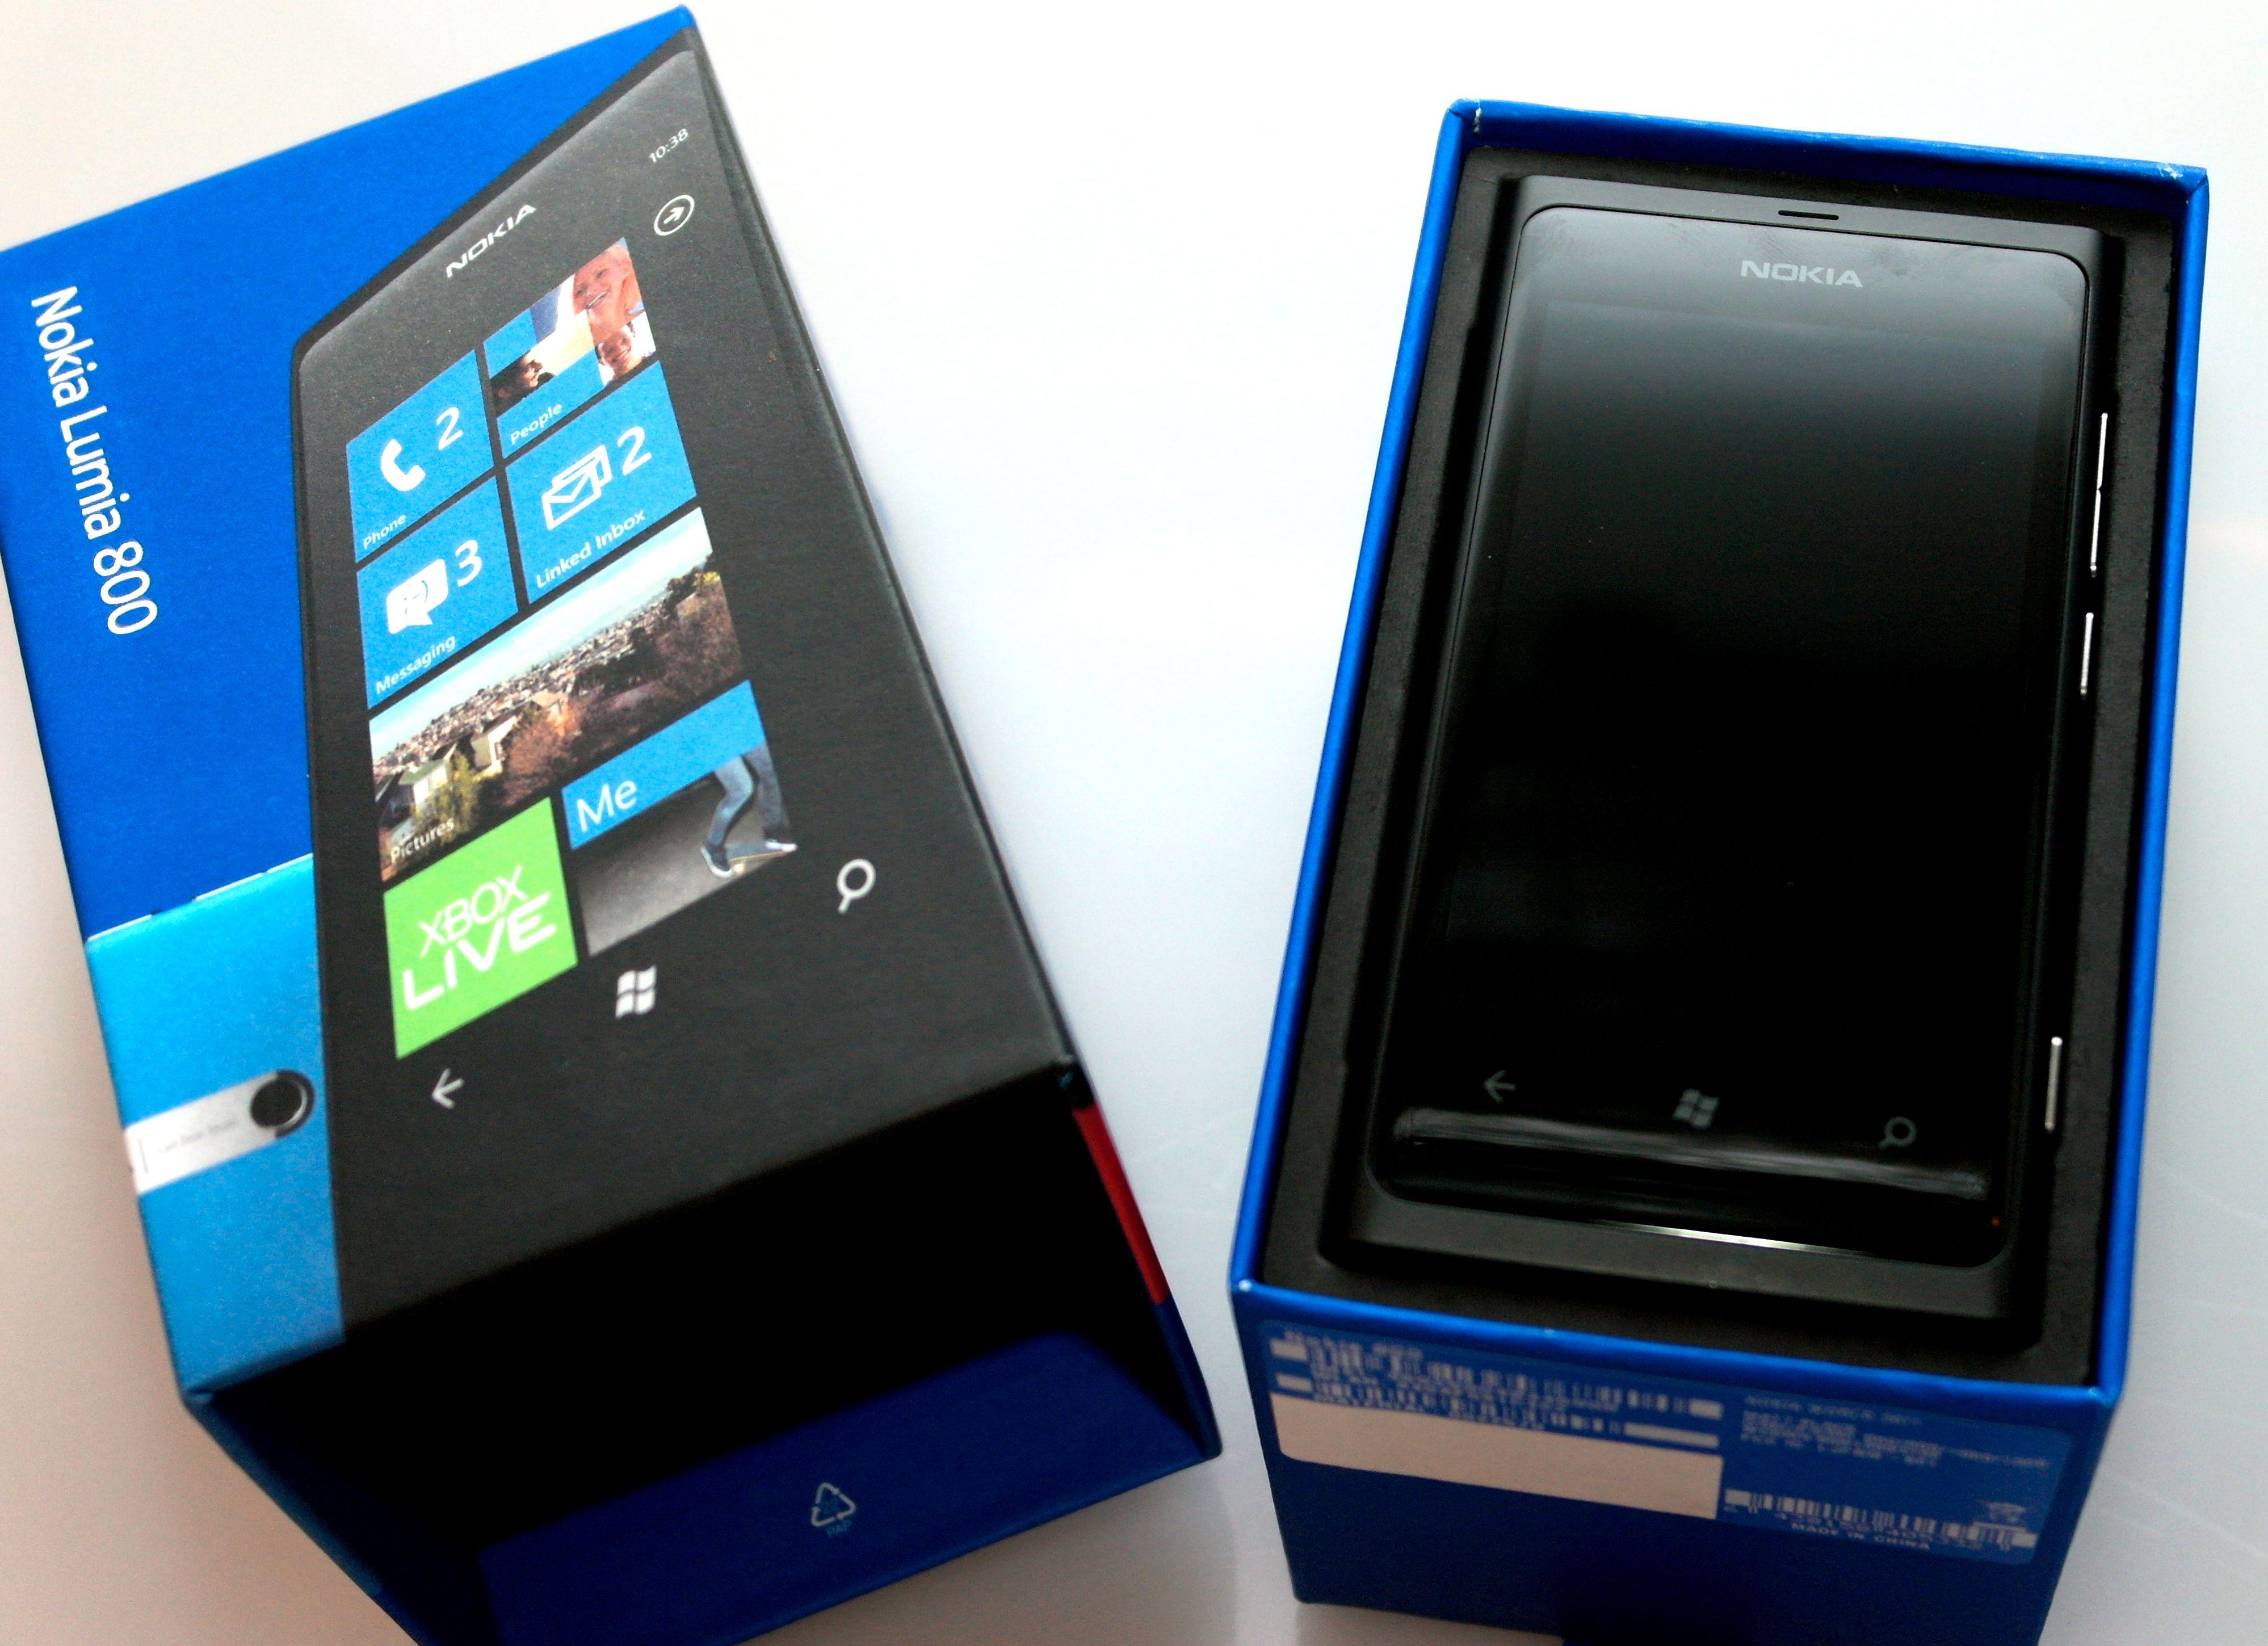 Lumia 800 er Nokias første telefon med Microsofts Windows Phone-menyer.